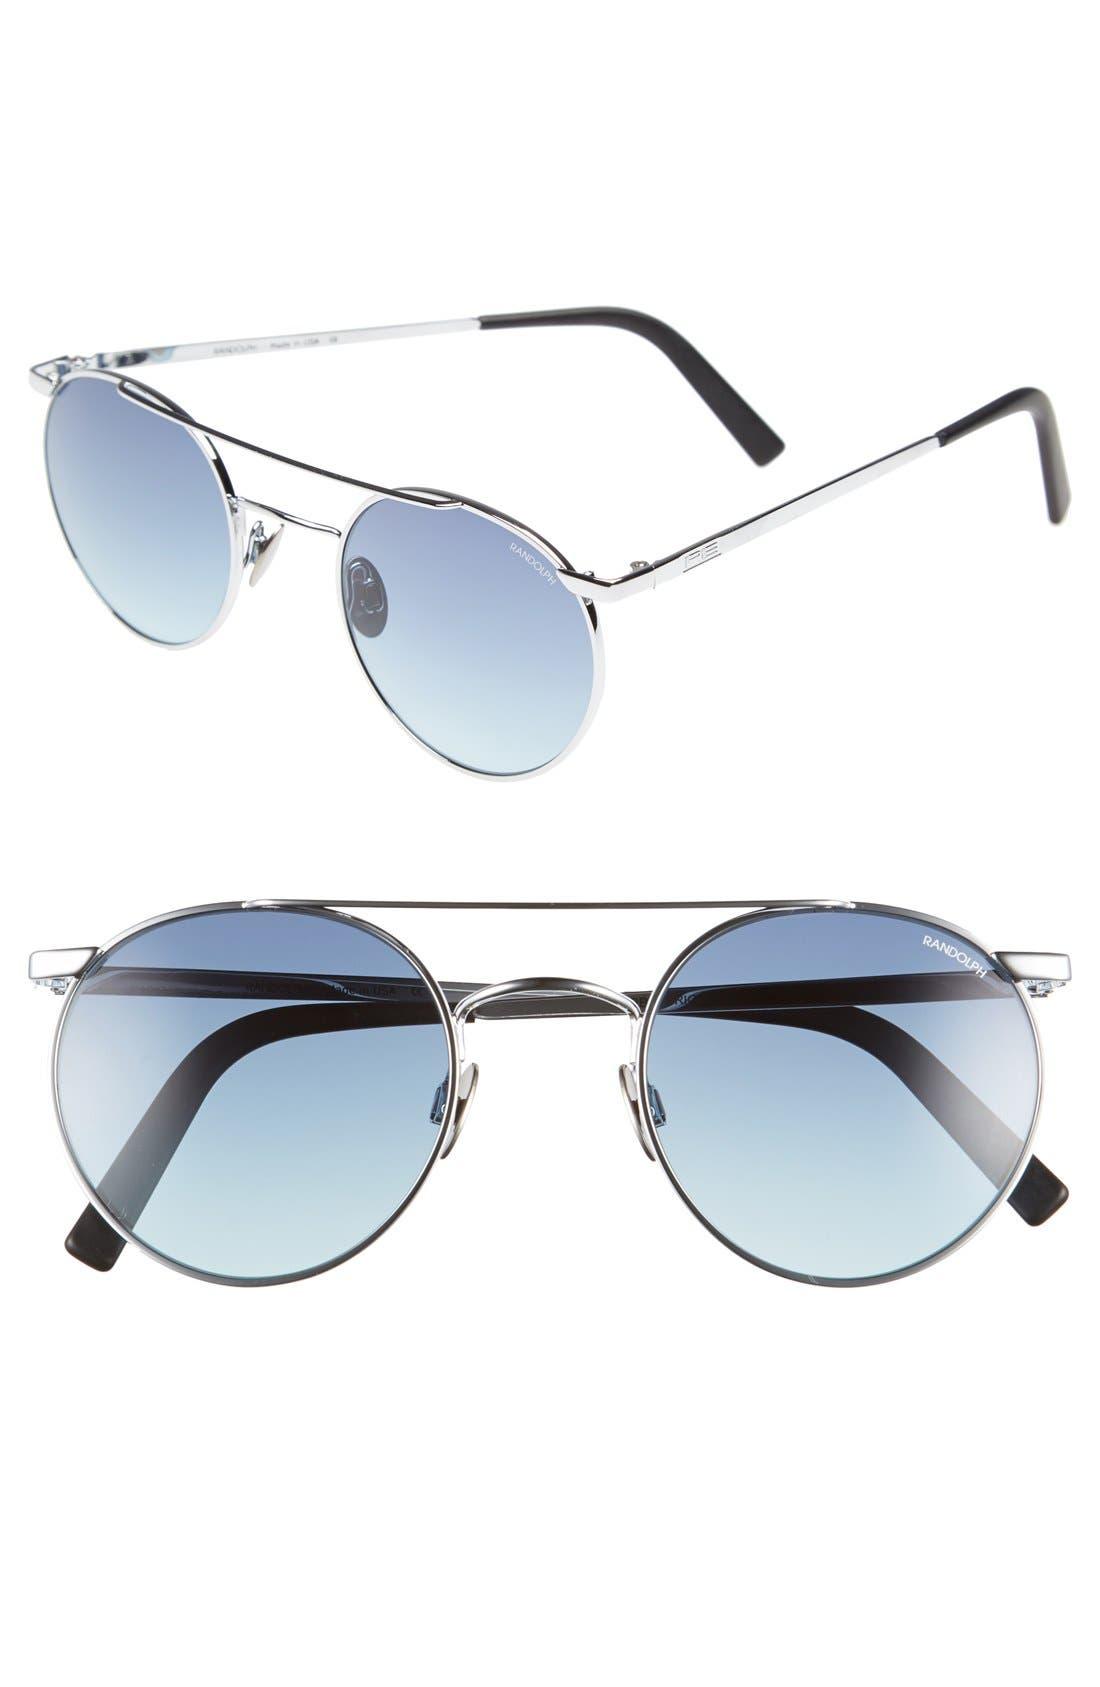 'Shadow' Retro Sunglasses,                             Main thumbnail 1, color,                             040